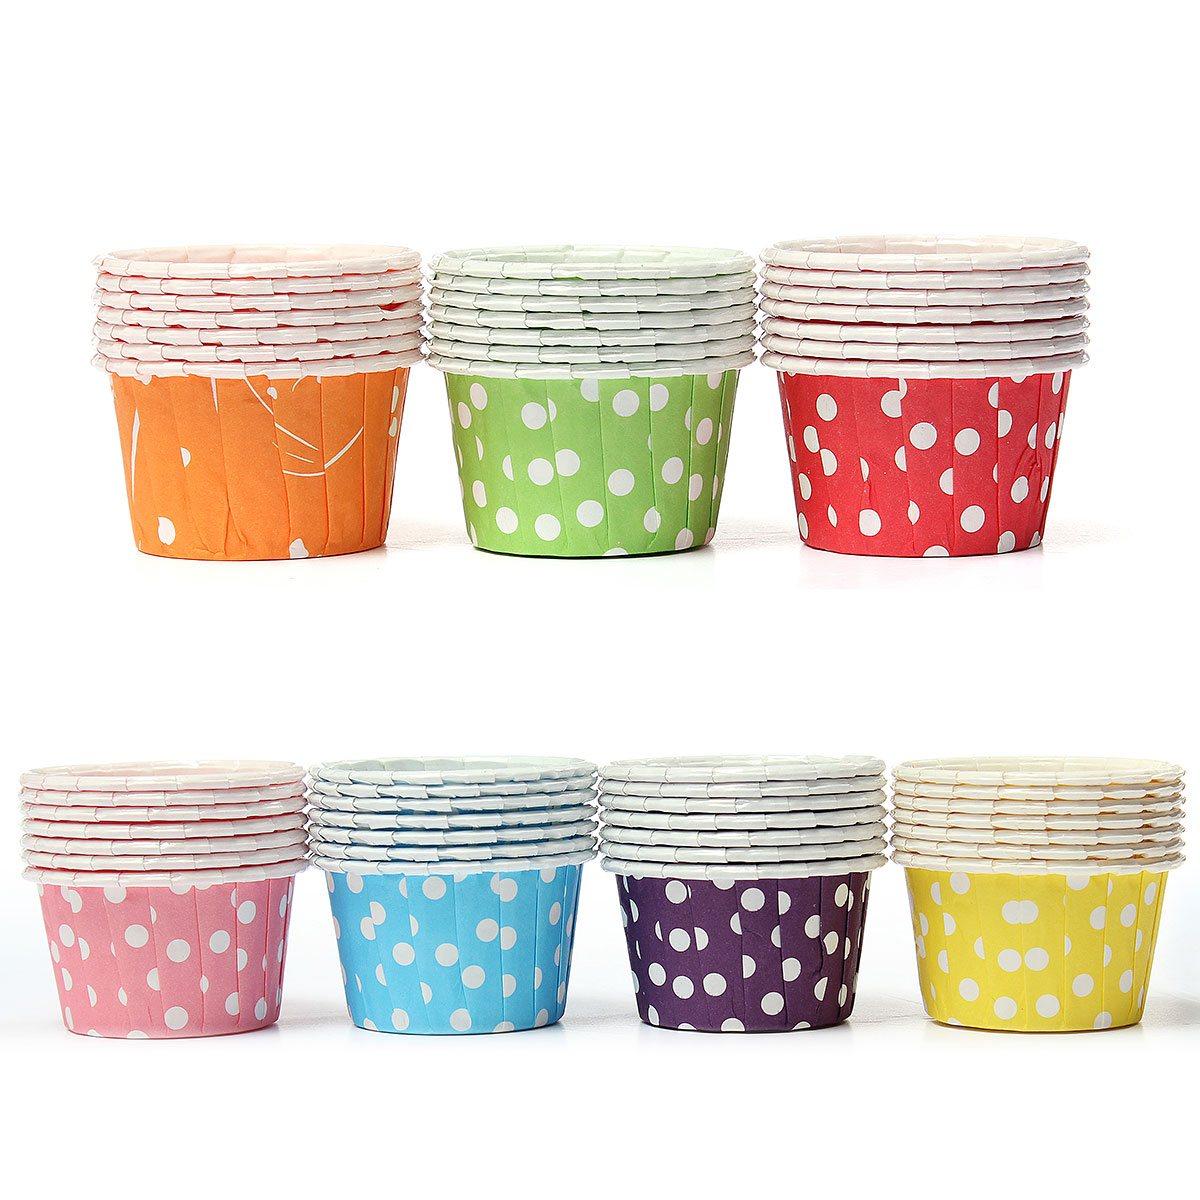 New 100Pcs Cute Dot Design Cake Liner Cupcake Miffin Cases Baking Dessert Holder Cups(China (Mainland))